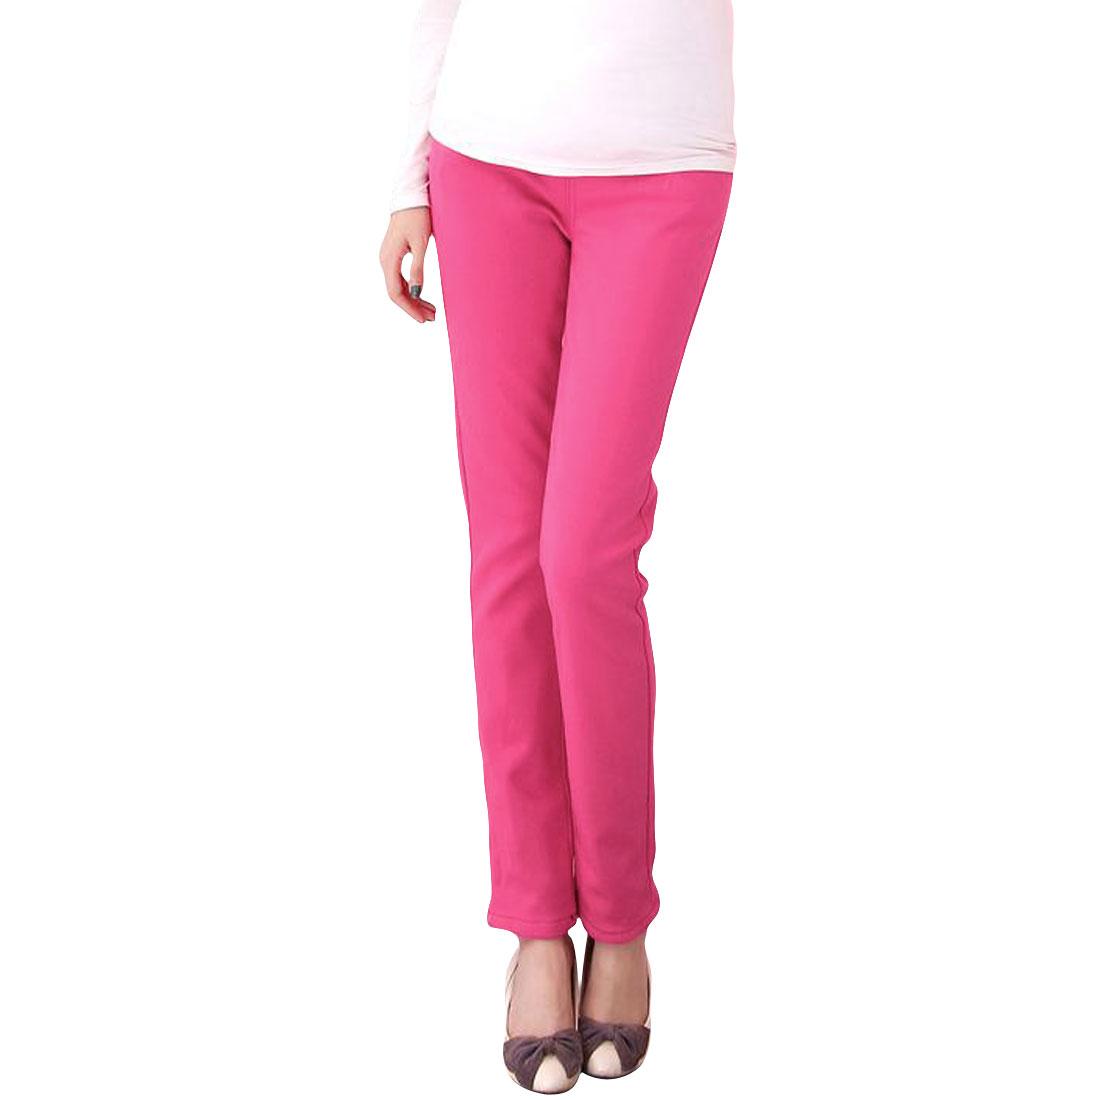 Morherhood Deep Pink Stretchy Waistband Hip Pockets Trousers M